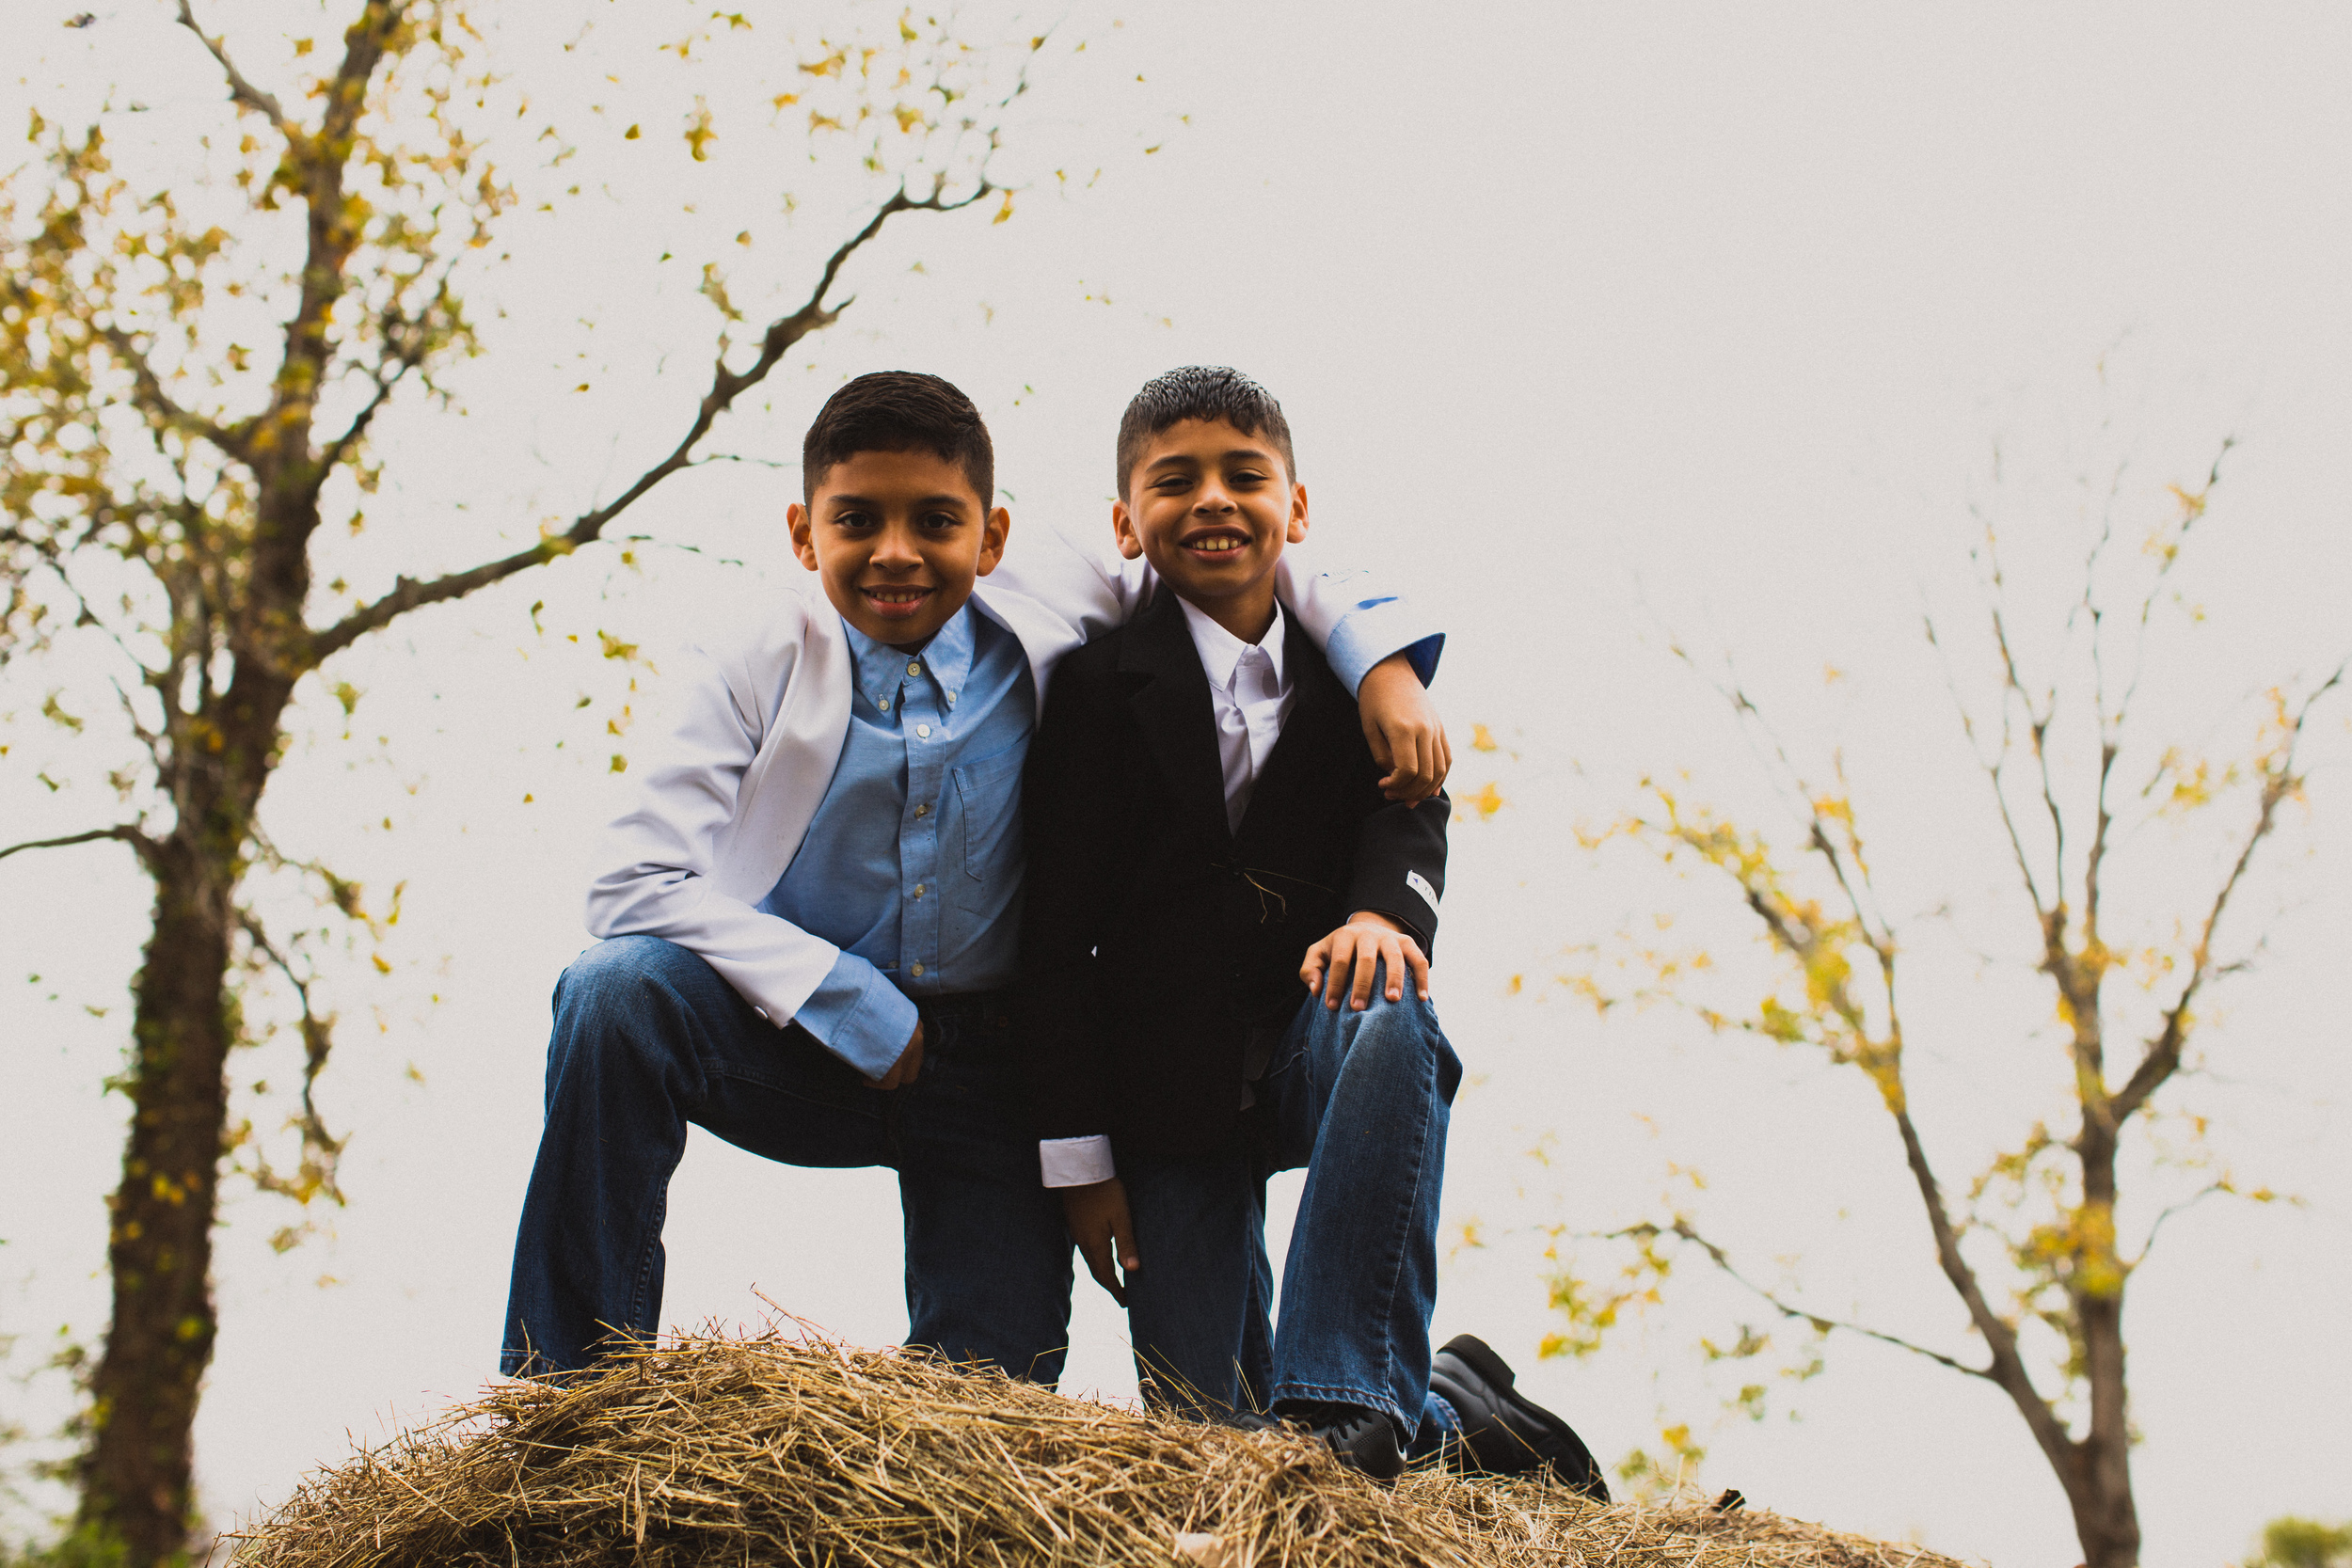 houston family photography_h2014_henriquez-259.jpg